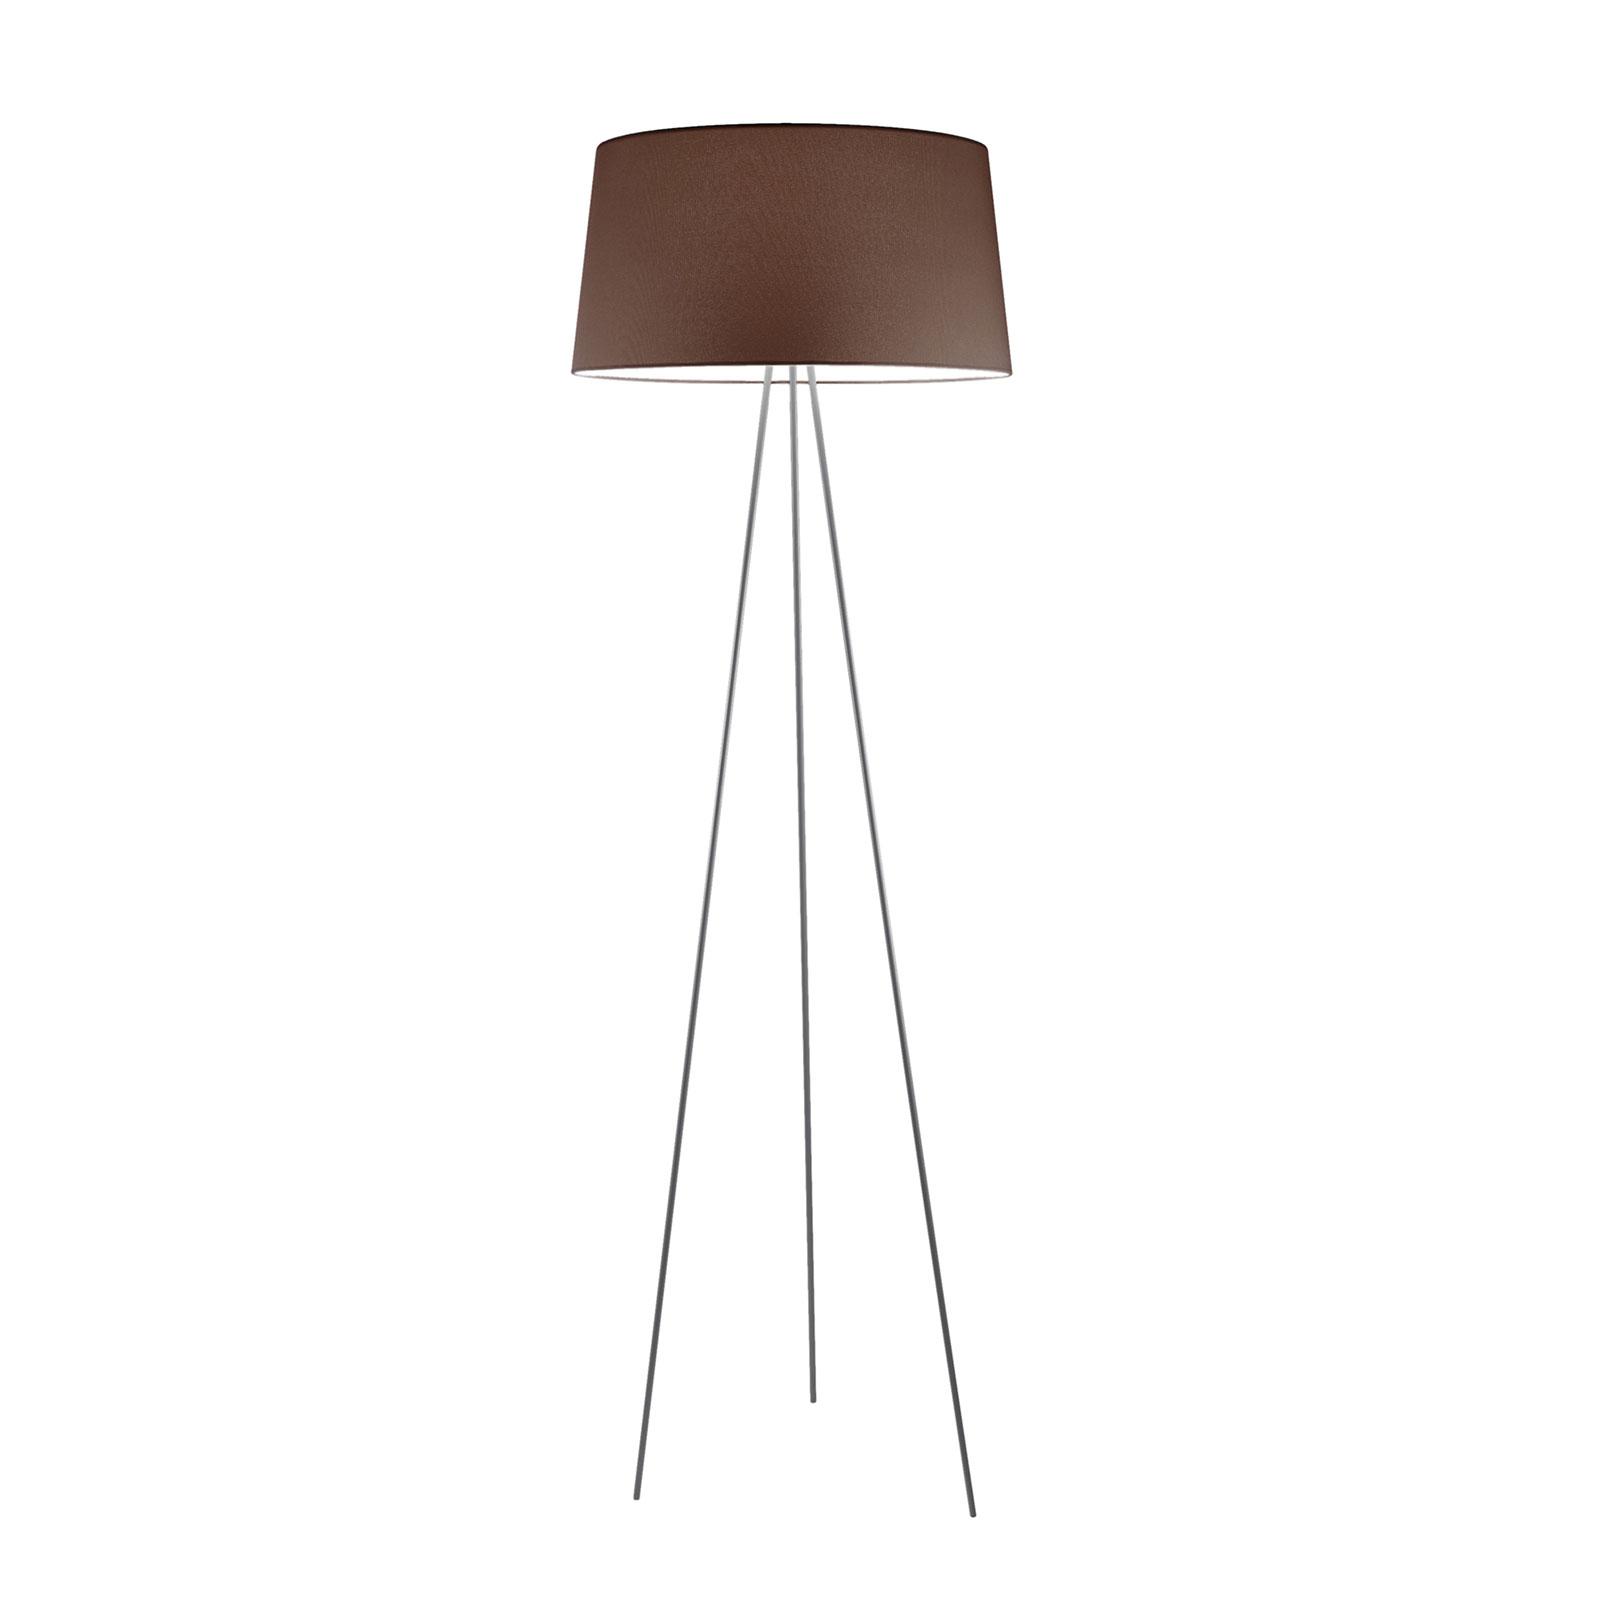 Kundalini Tripod lampa podłogowa mokka/szara